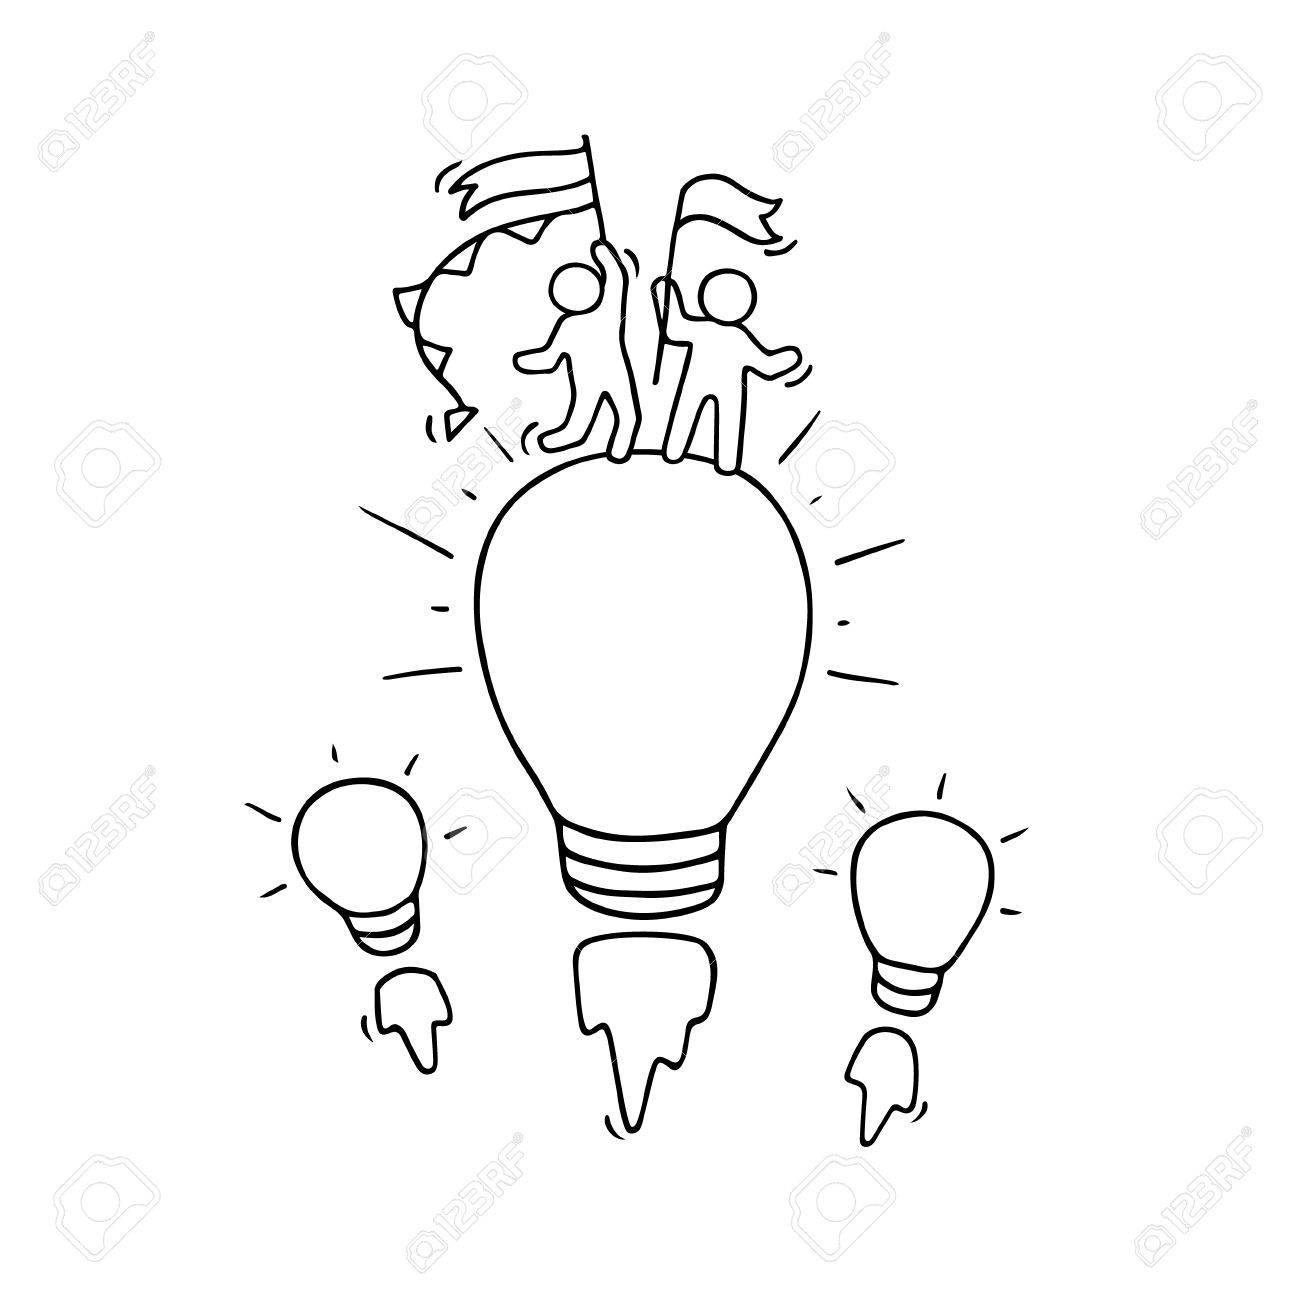 1300x1300 Cartoon Little People With Flying Lamp Idea. Doodle Cute Miniature